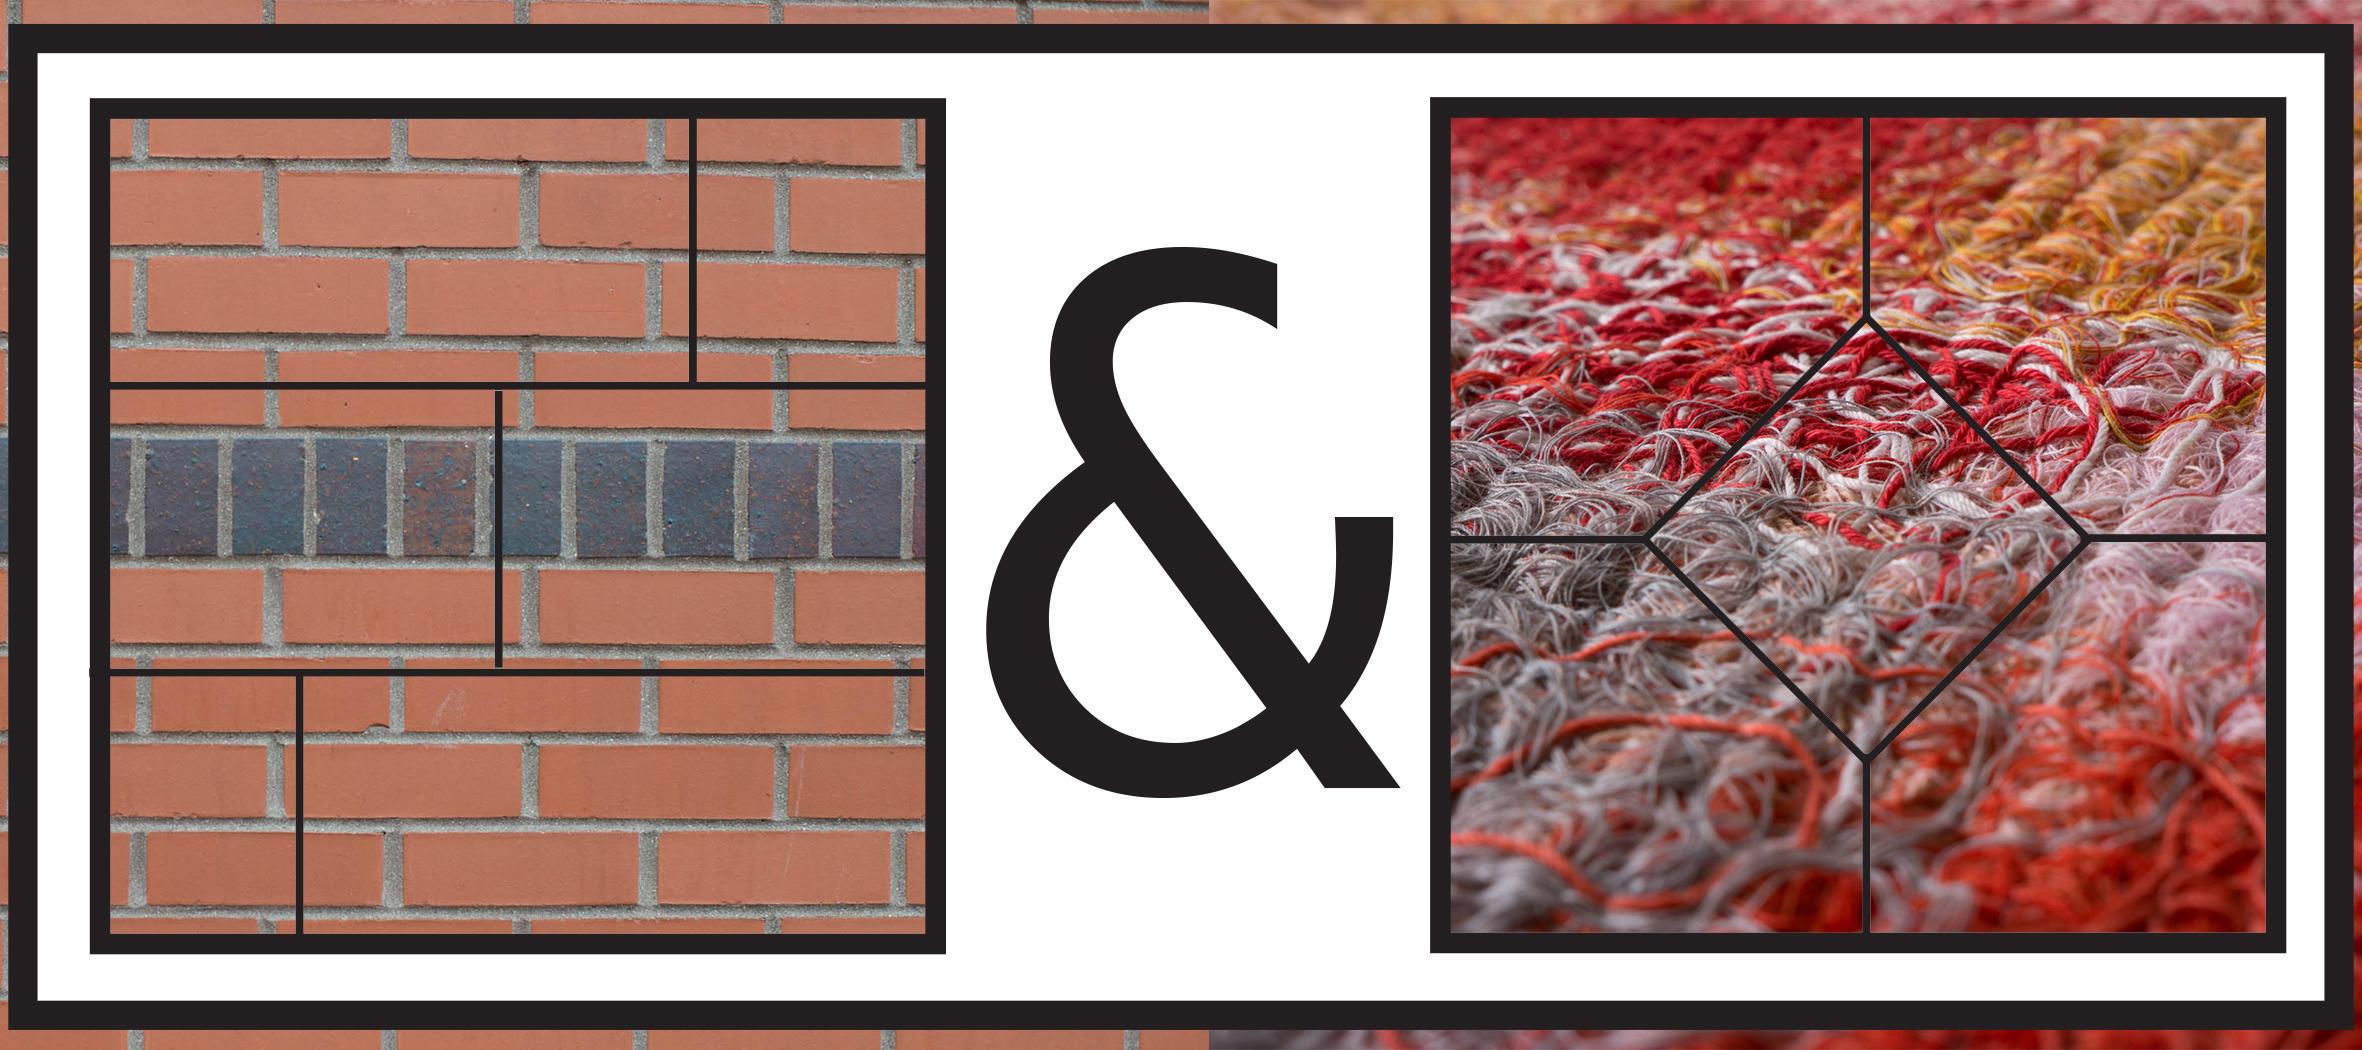 Bricks and Blocks Catherine Reinhart Grinnell Arts Center